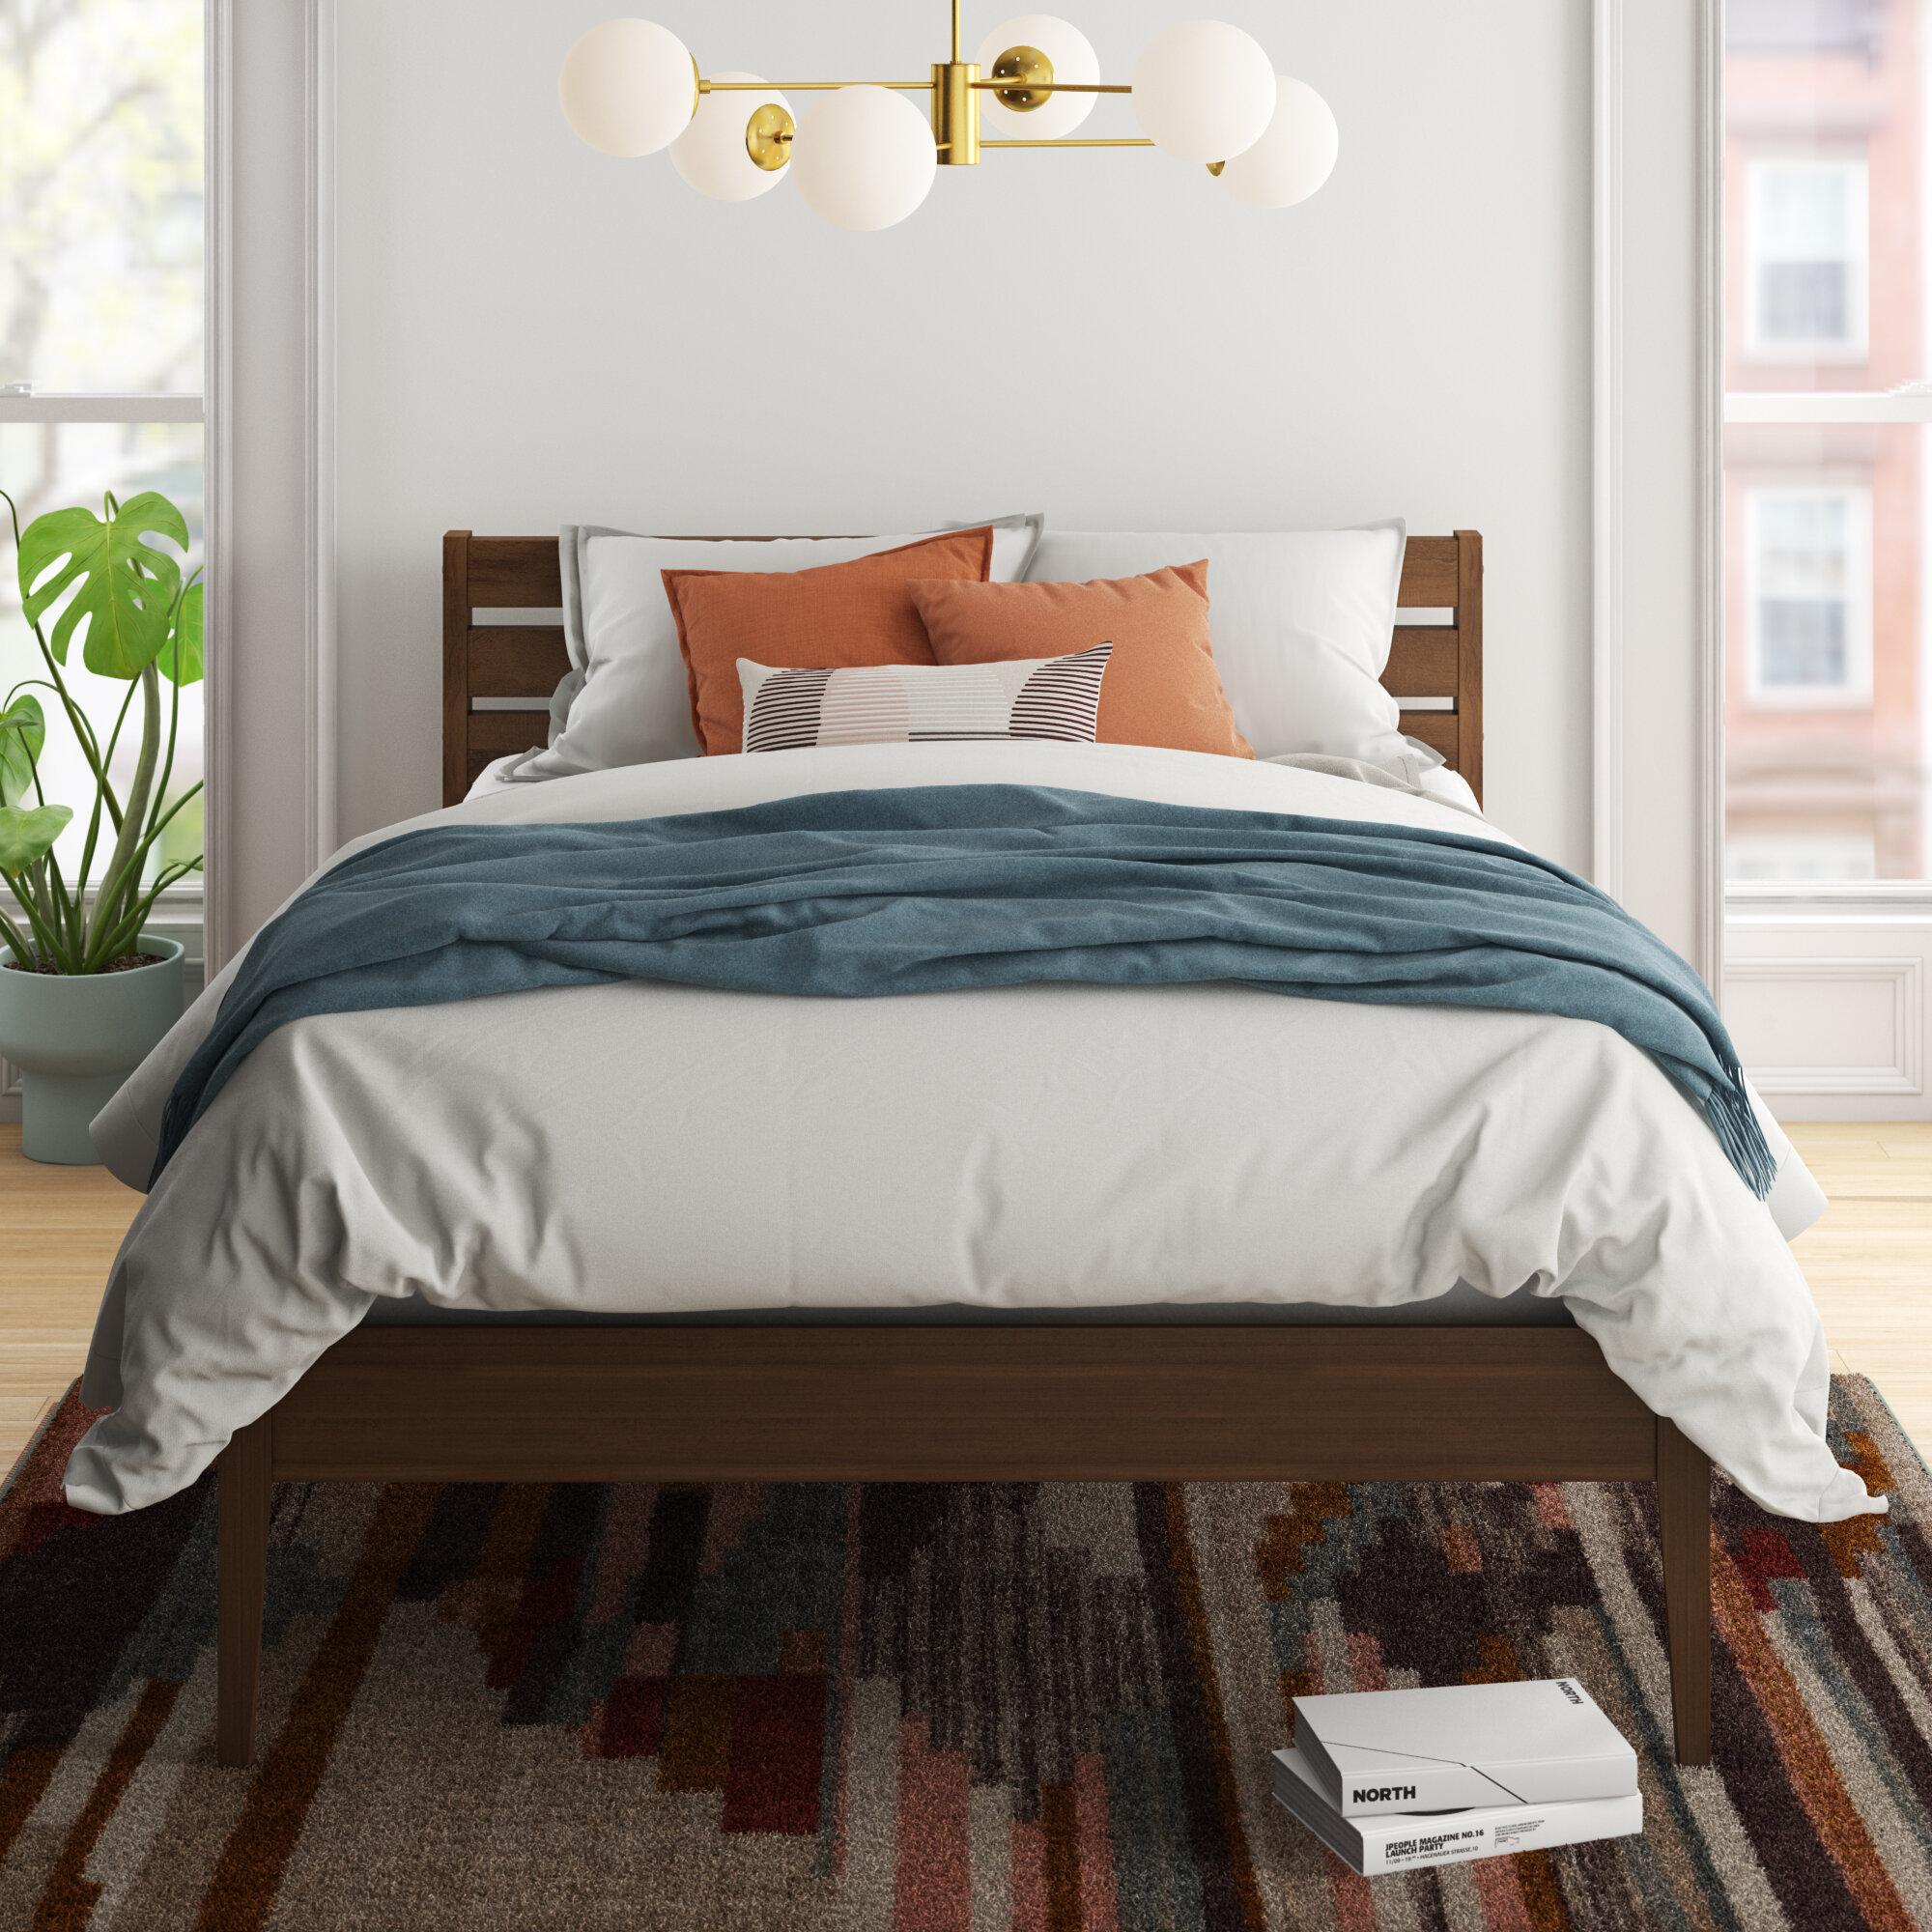 Mercury Row Ailey Solid Wood Platform Bed Reviews Wayfair